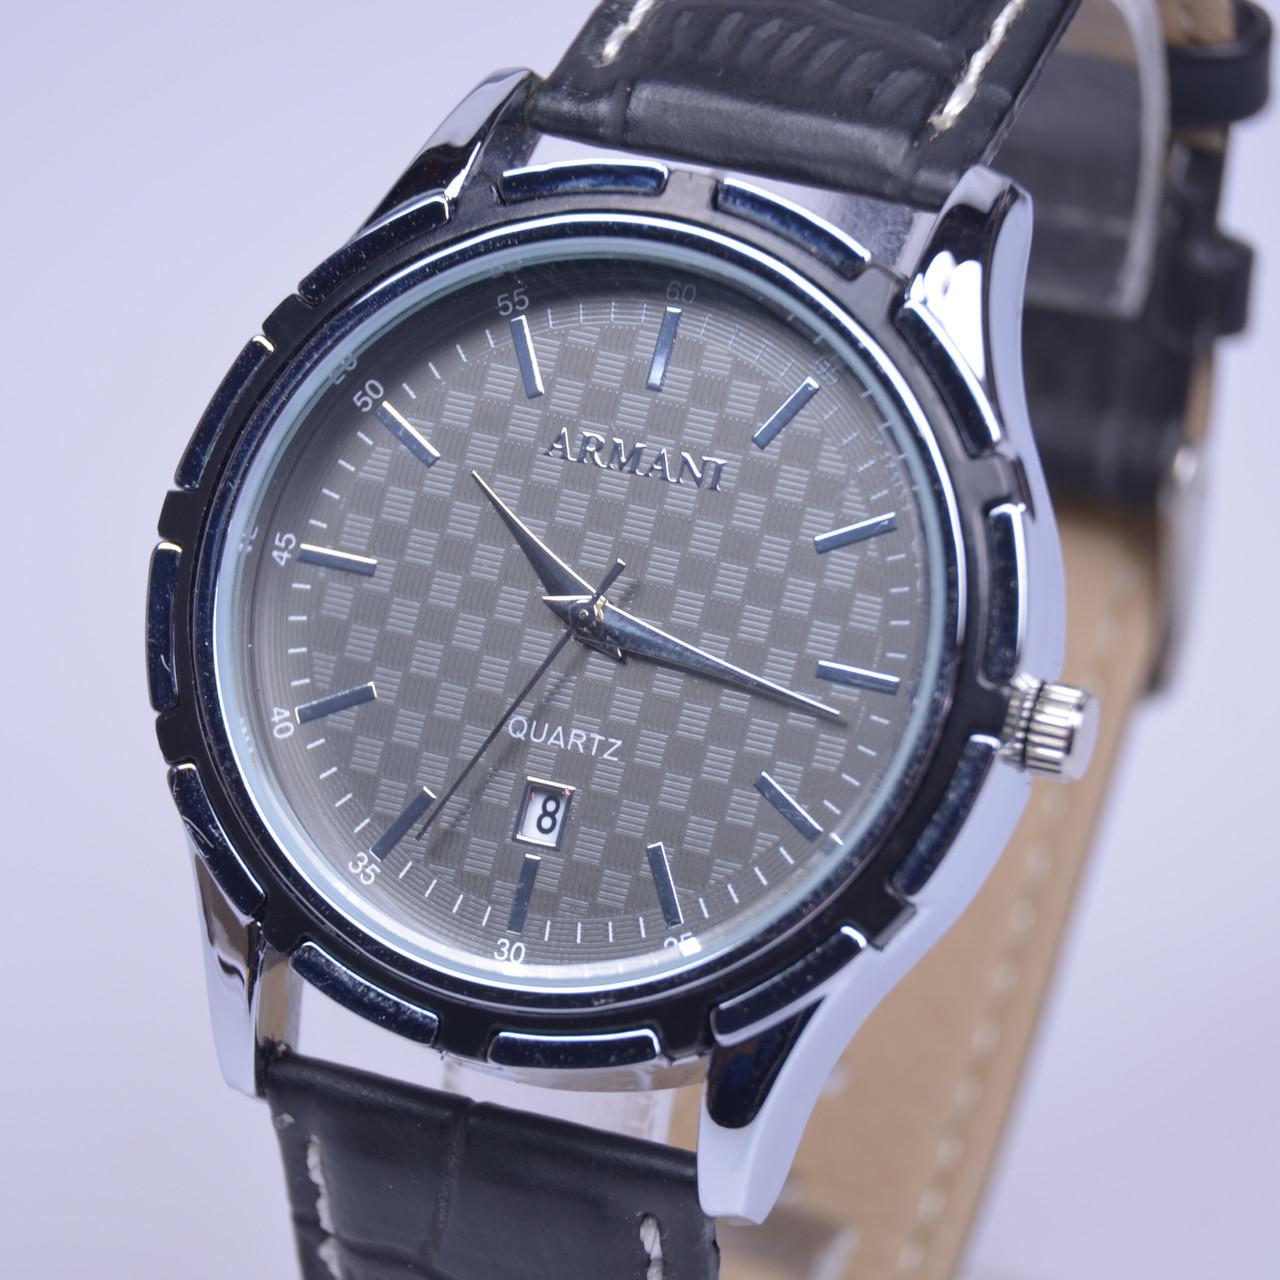 Мужские наручные часы Armani Silver календарь